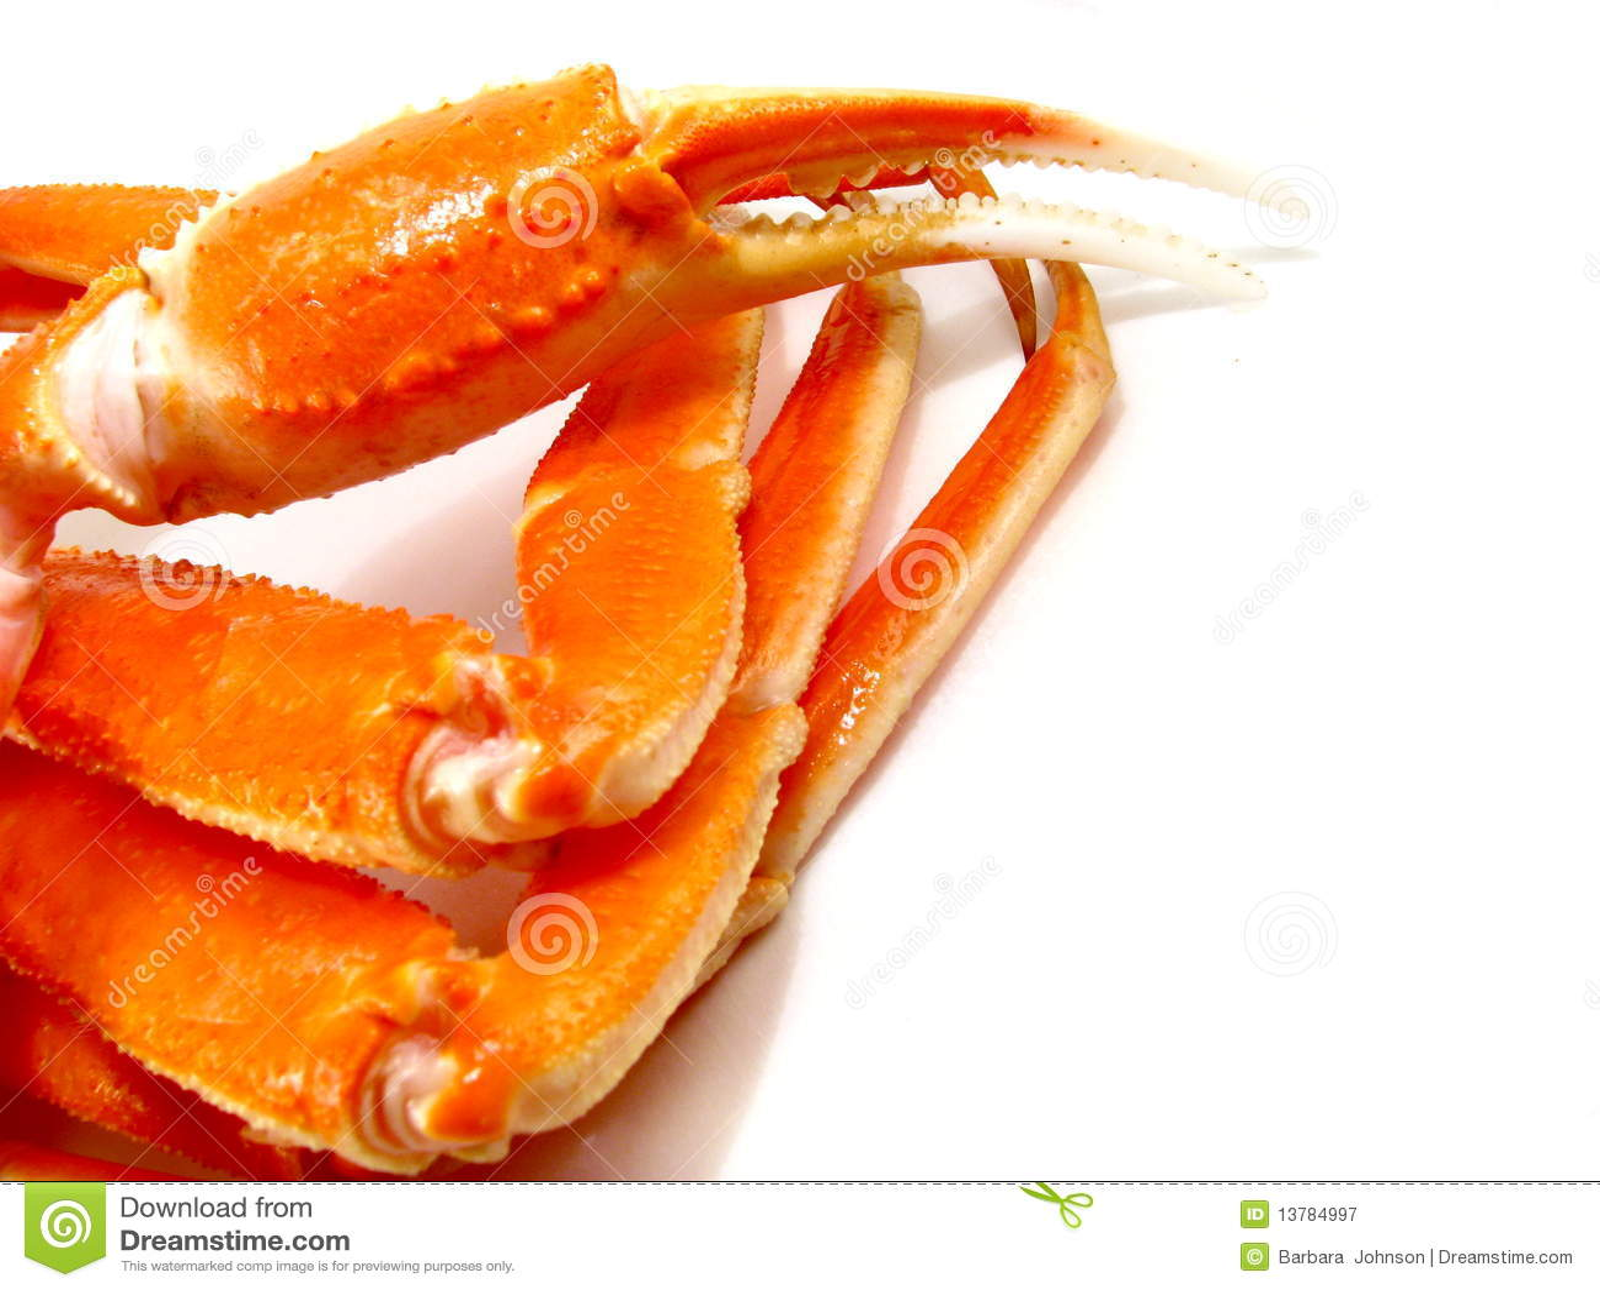 snow crab legs stock photo image 61711426